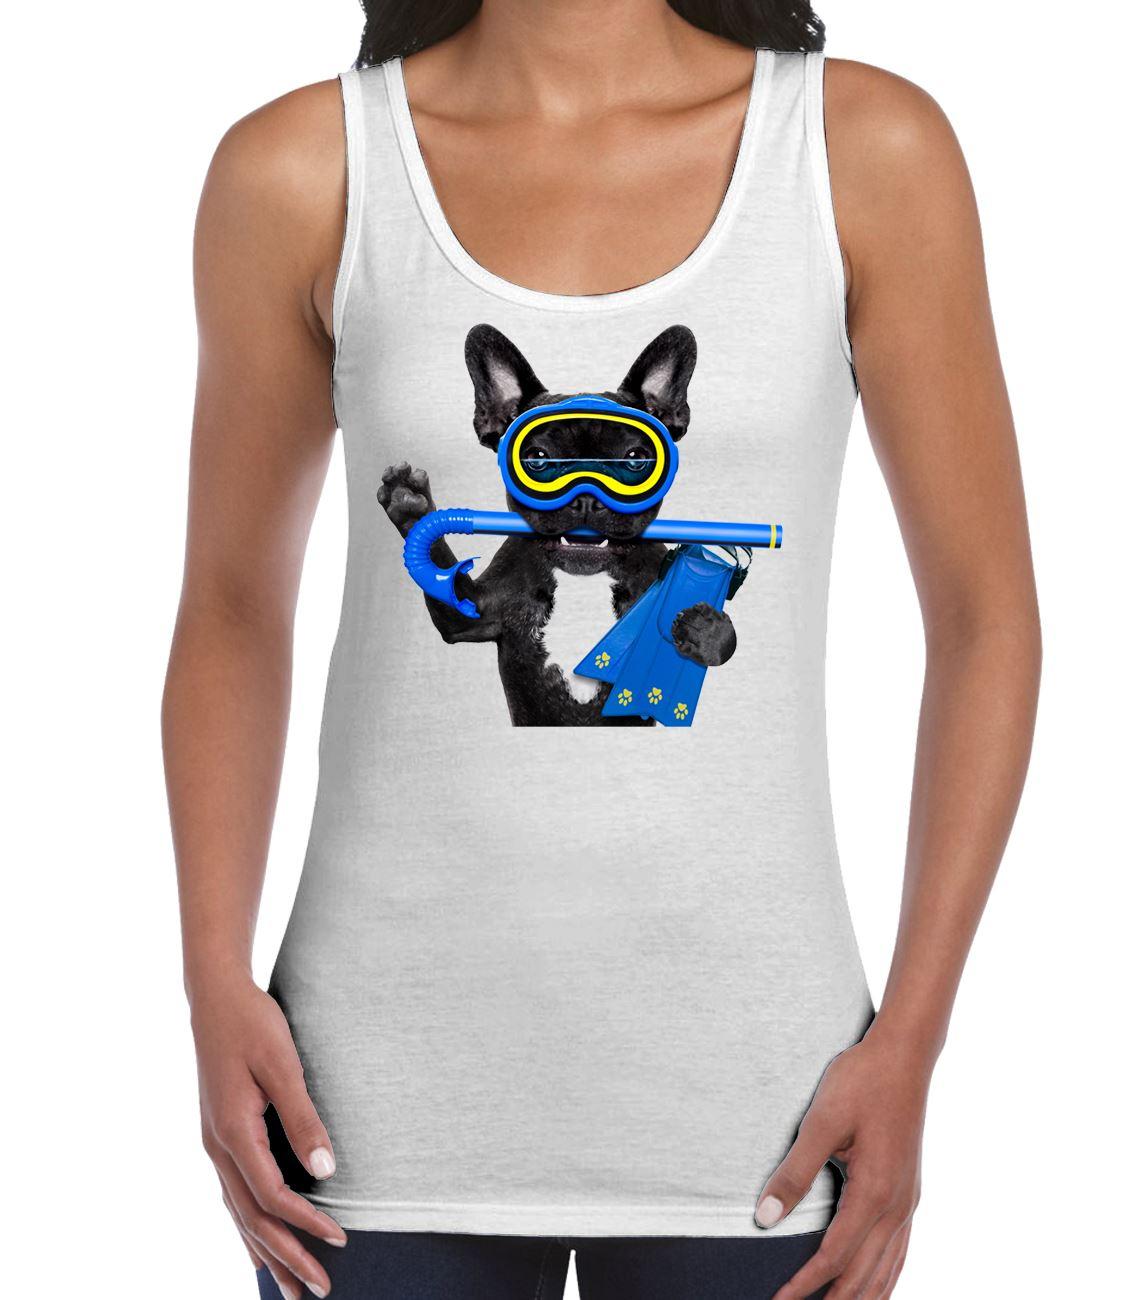 Love Frenchy Women/'s burnout racerback tank top french bulldog shirts